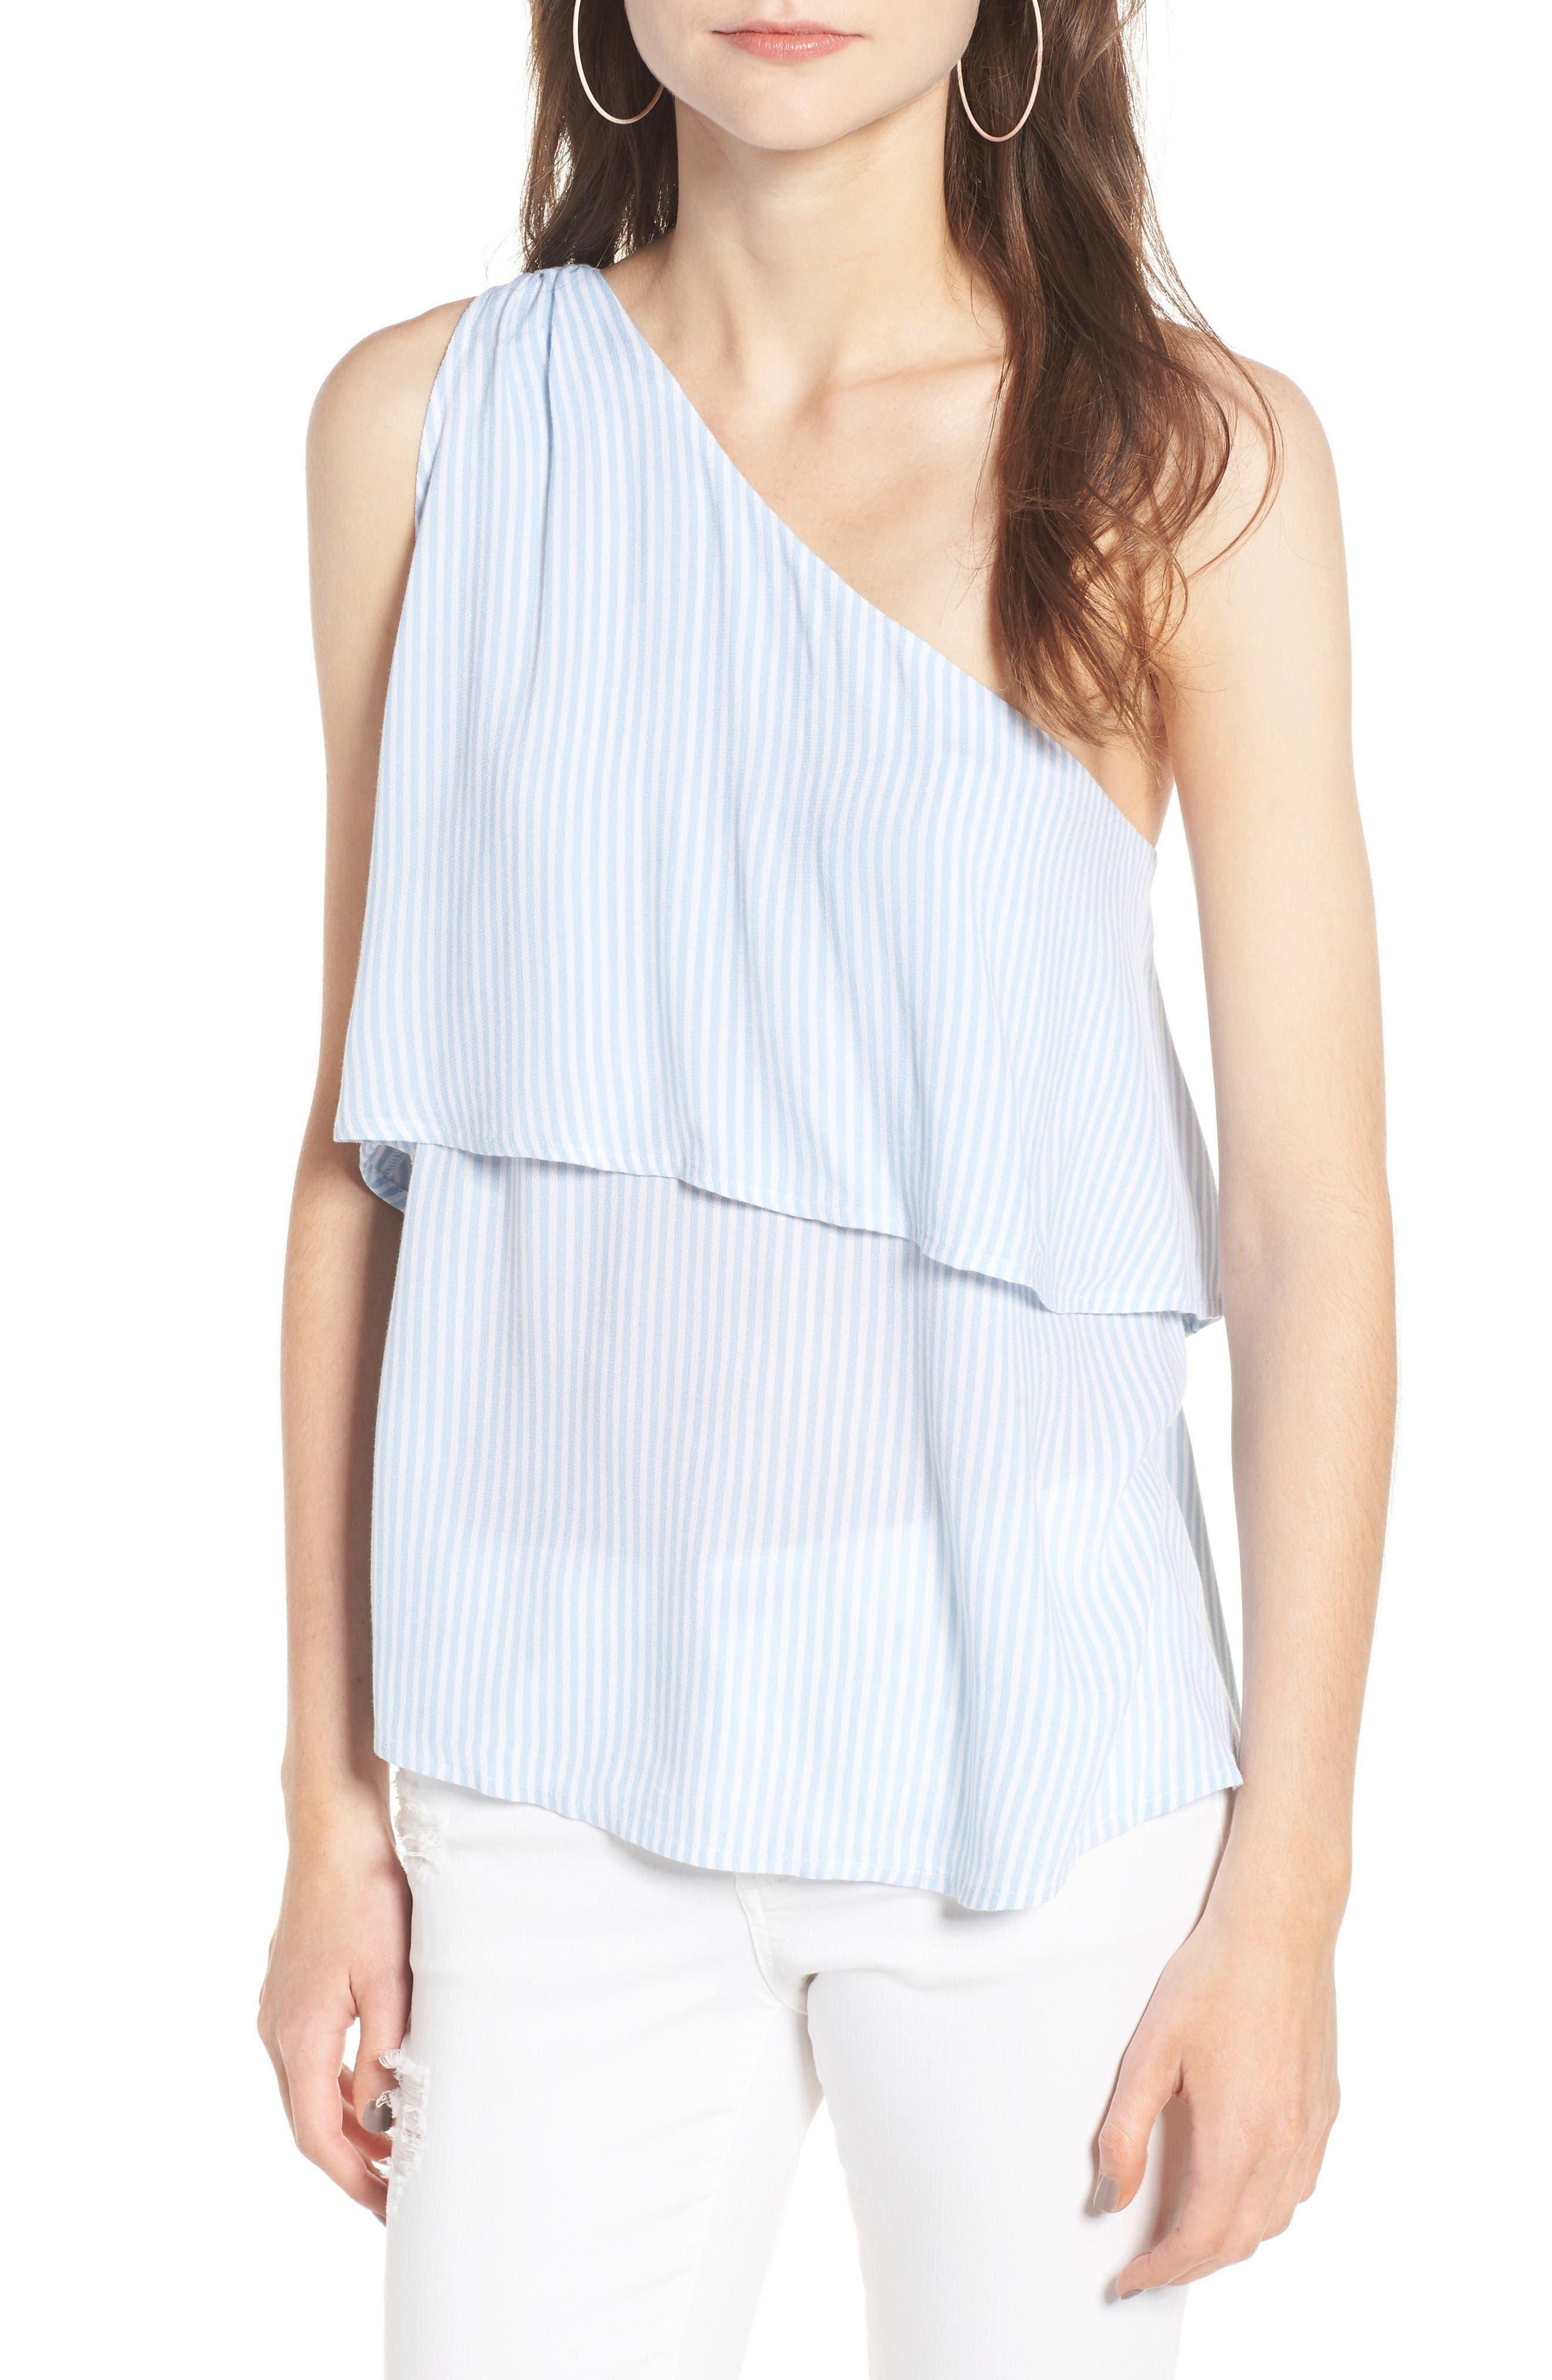 One-Shoulder Top,                         Main,                         color, Blue Cashmer Classic Stripe